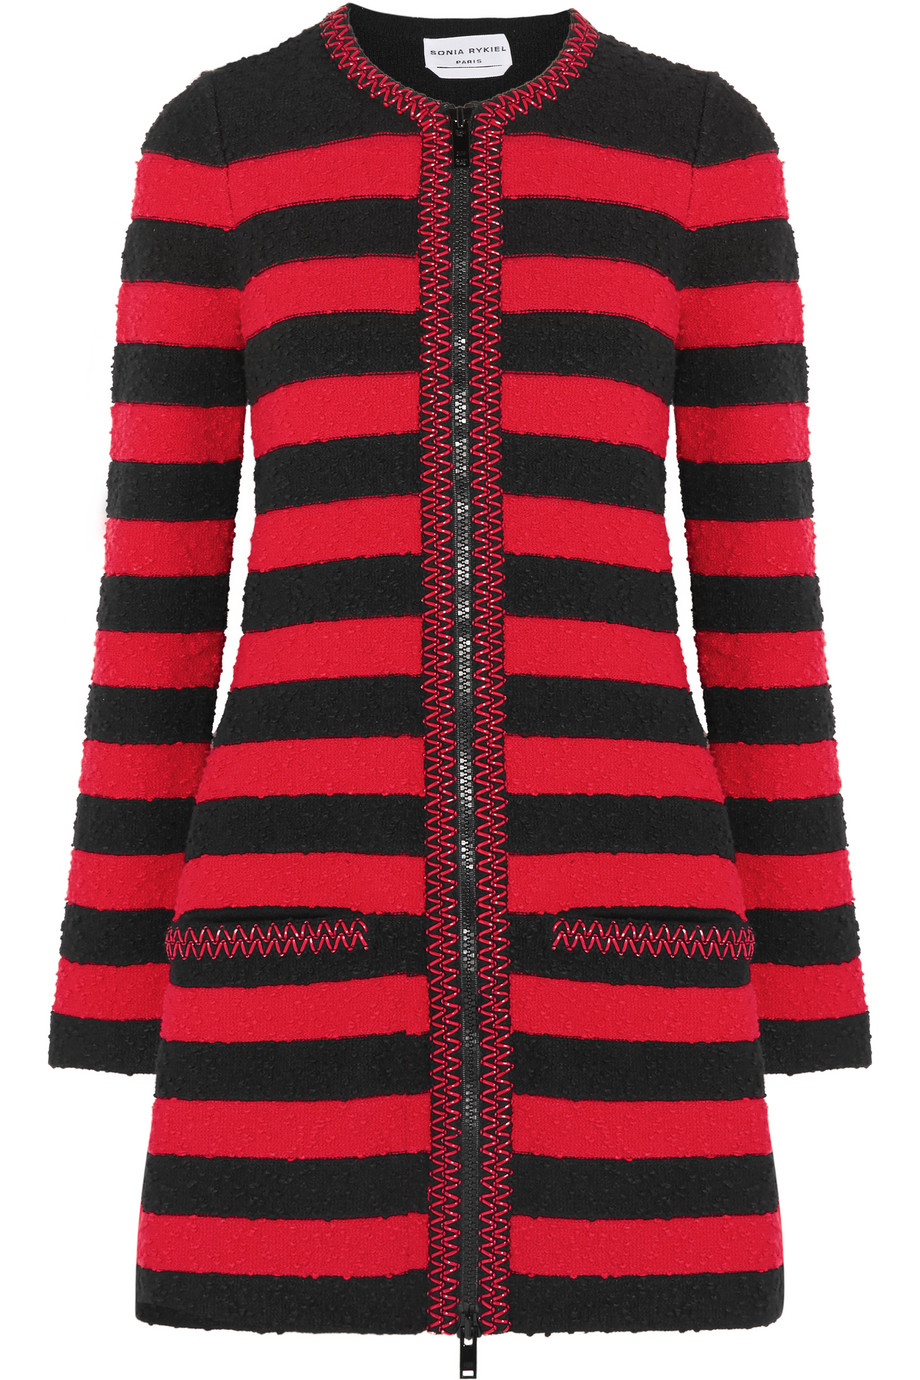 Sonia Rykiel Embellished Striped Stretch-Bouclé Coat, Red/Black, Women's, Size: 38